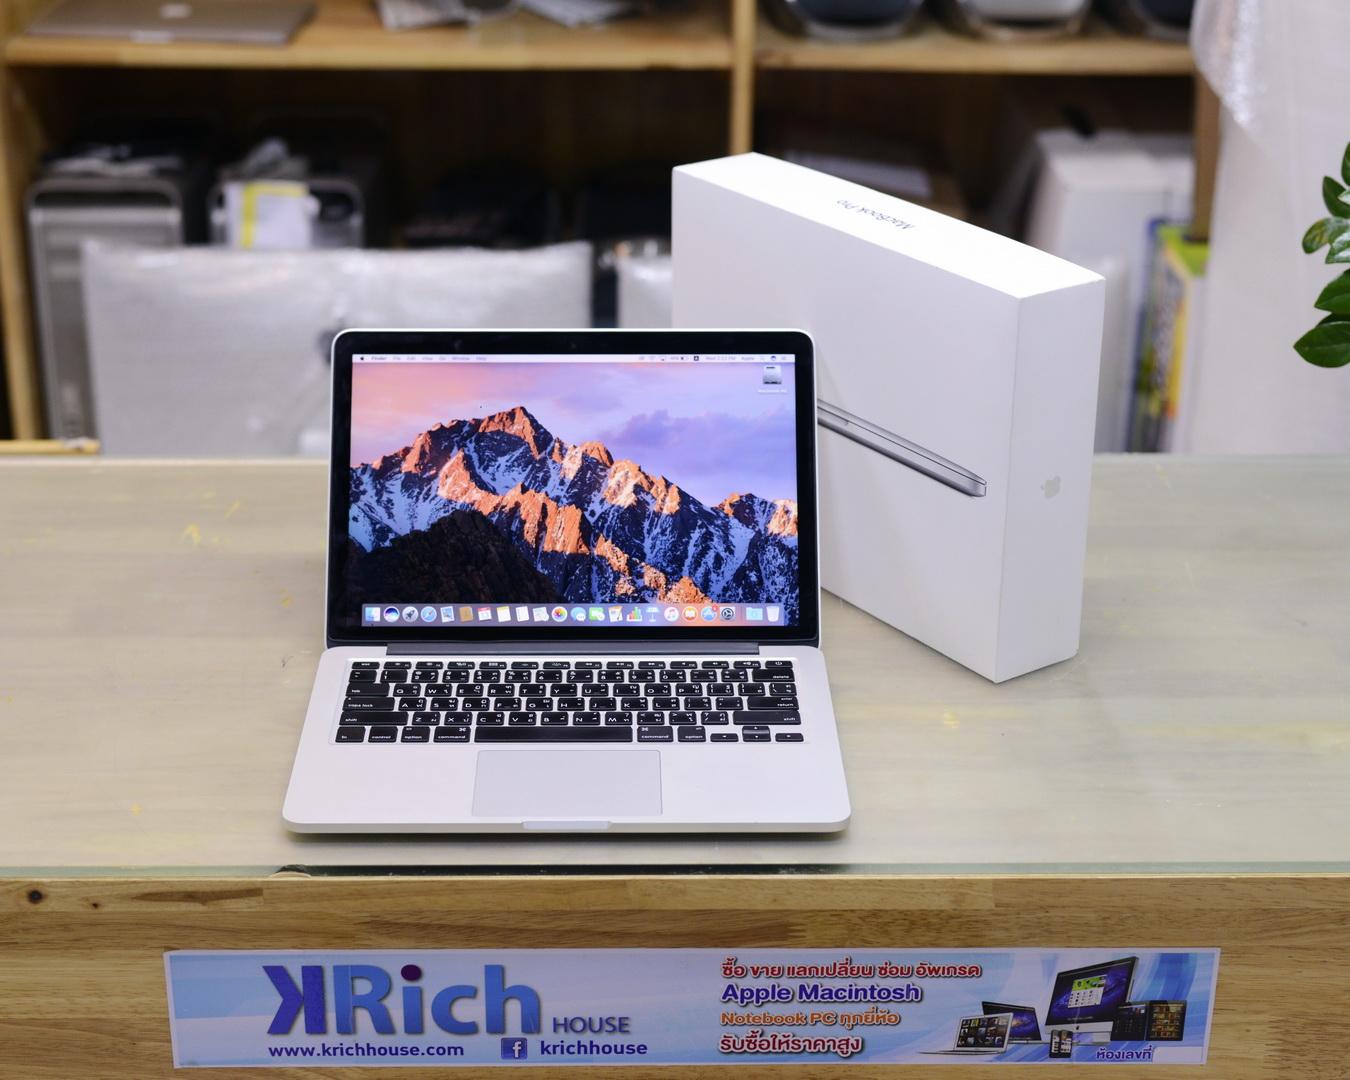 MacBook Pro (Retina, 13-inch, Late 2013) Core i5 2.4GHz RAM 8GB SSD 256GB - Fullbox